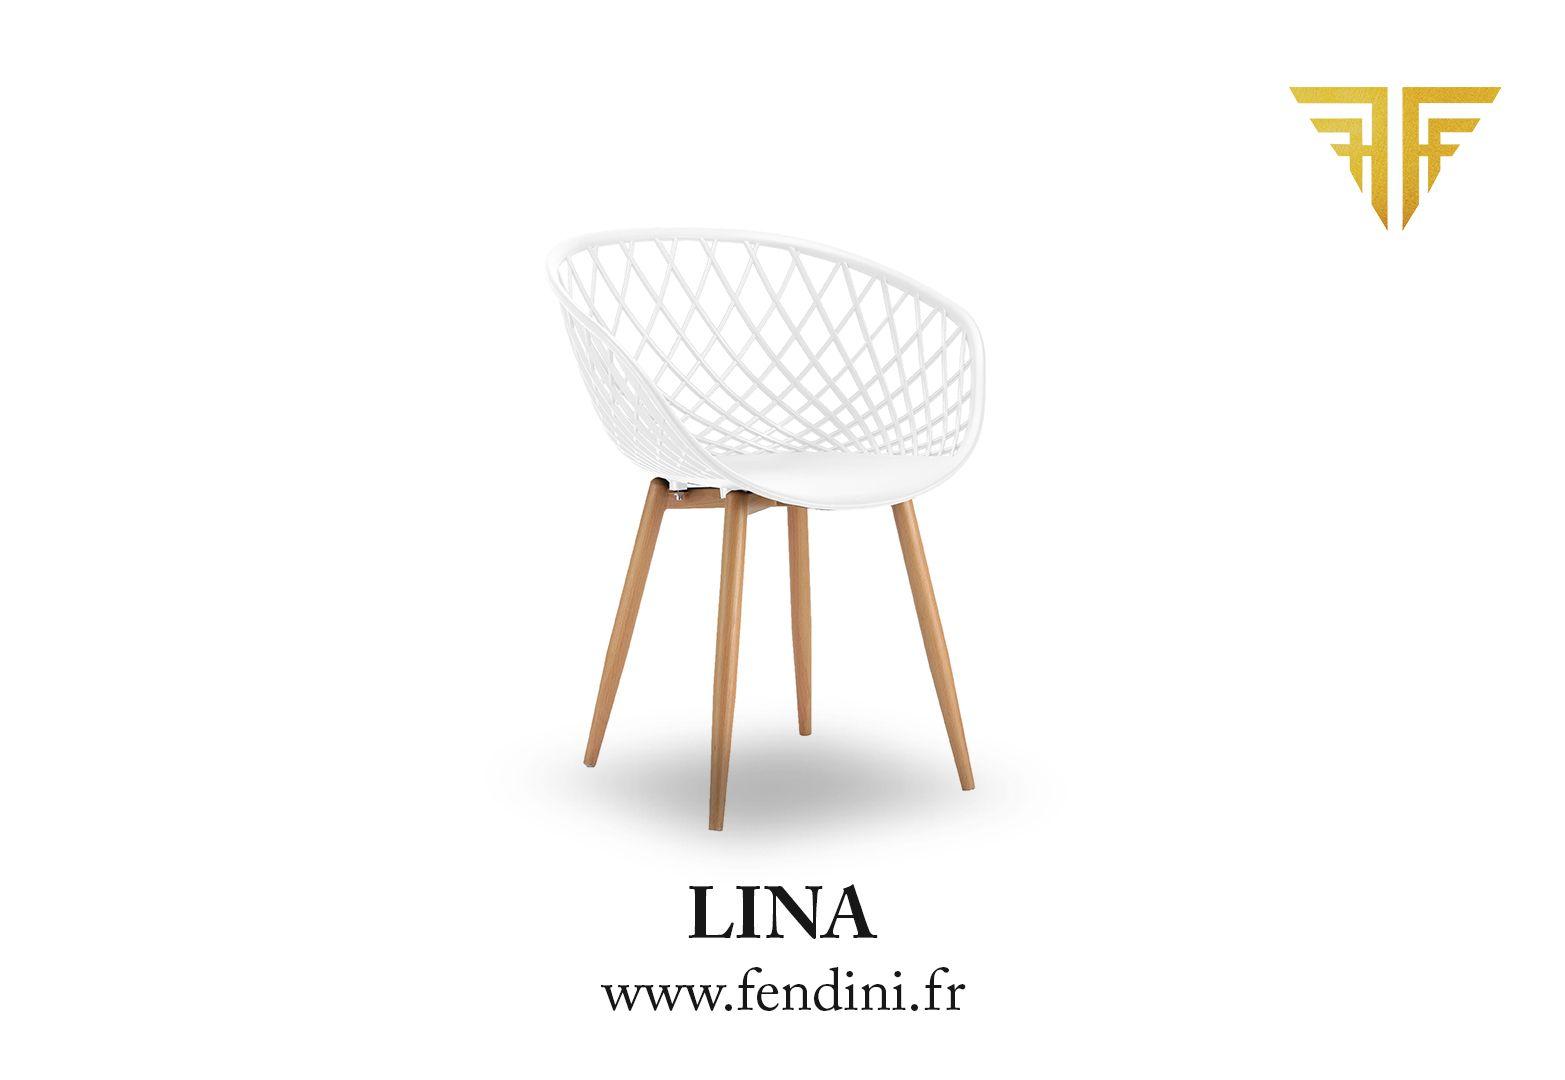 Fauteuil Lina By Fendini Fendini Fendinihome Design Concept Designer Homedecor Homedesign Interiordesign Interior Inspir Retro Chic Modernite Retro